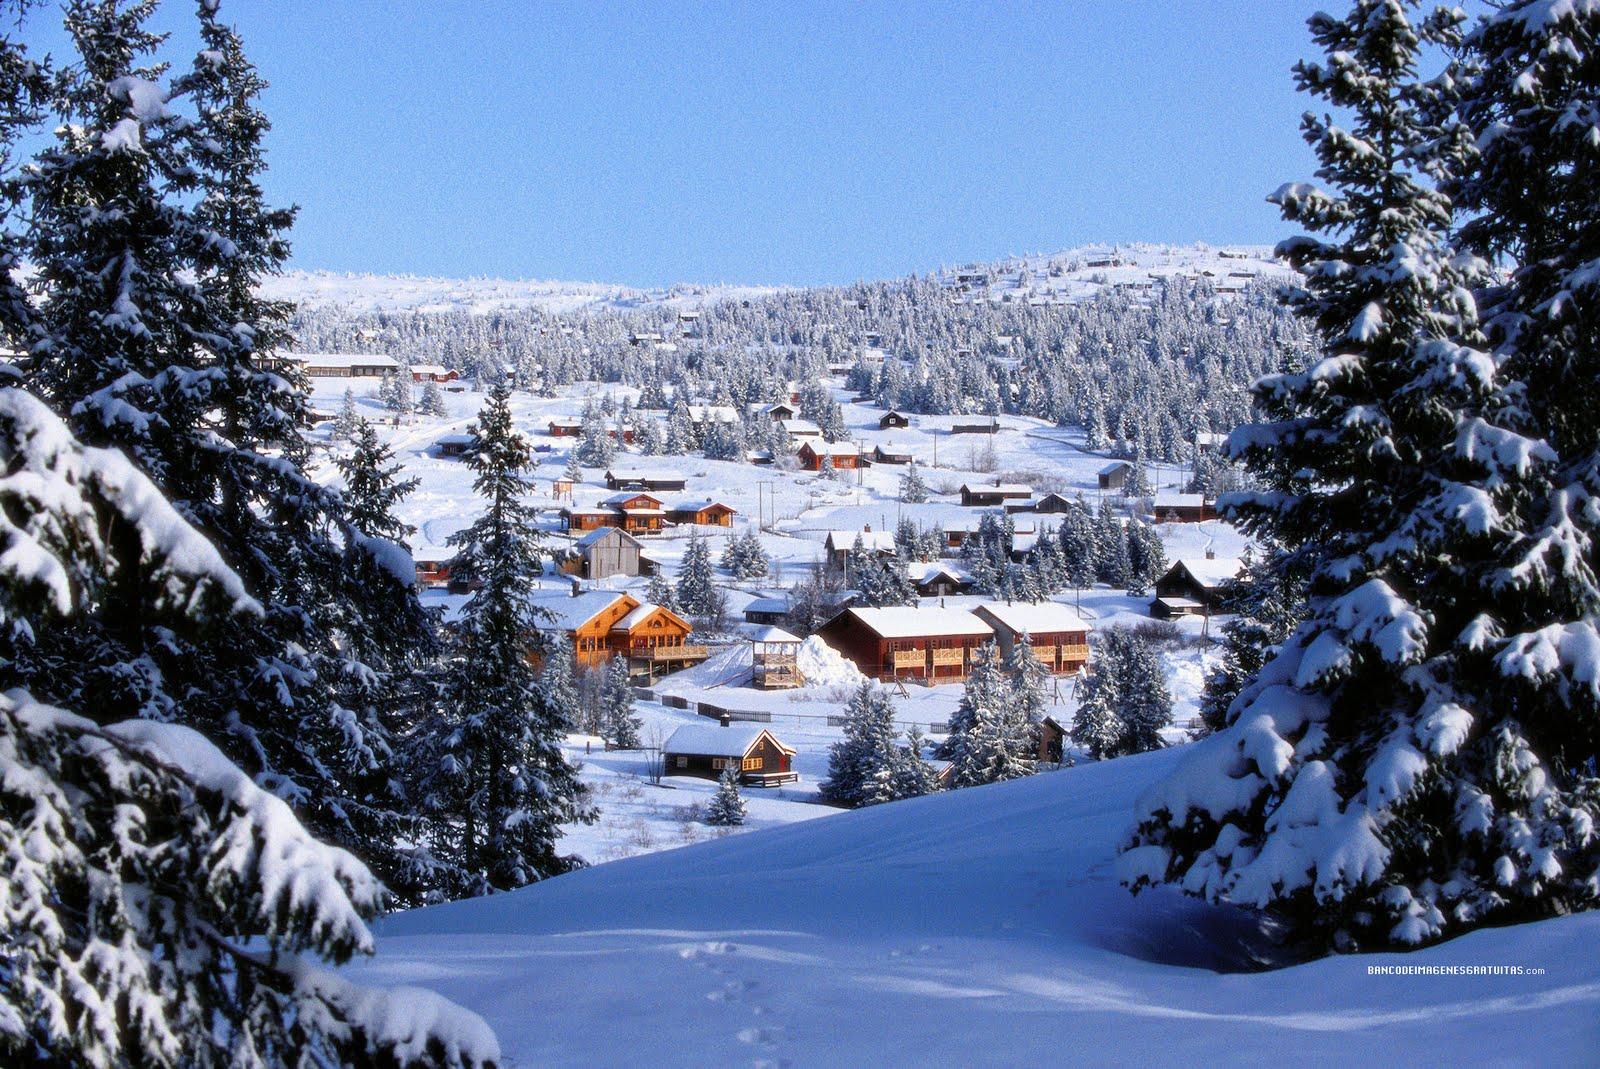 Fondos de paisajes nevados fondos de pantalla y mucho m s - Paisajes nevados para pintar ...